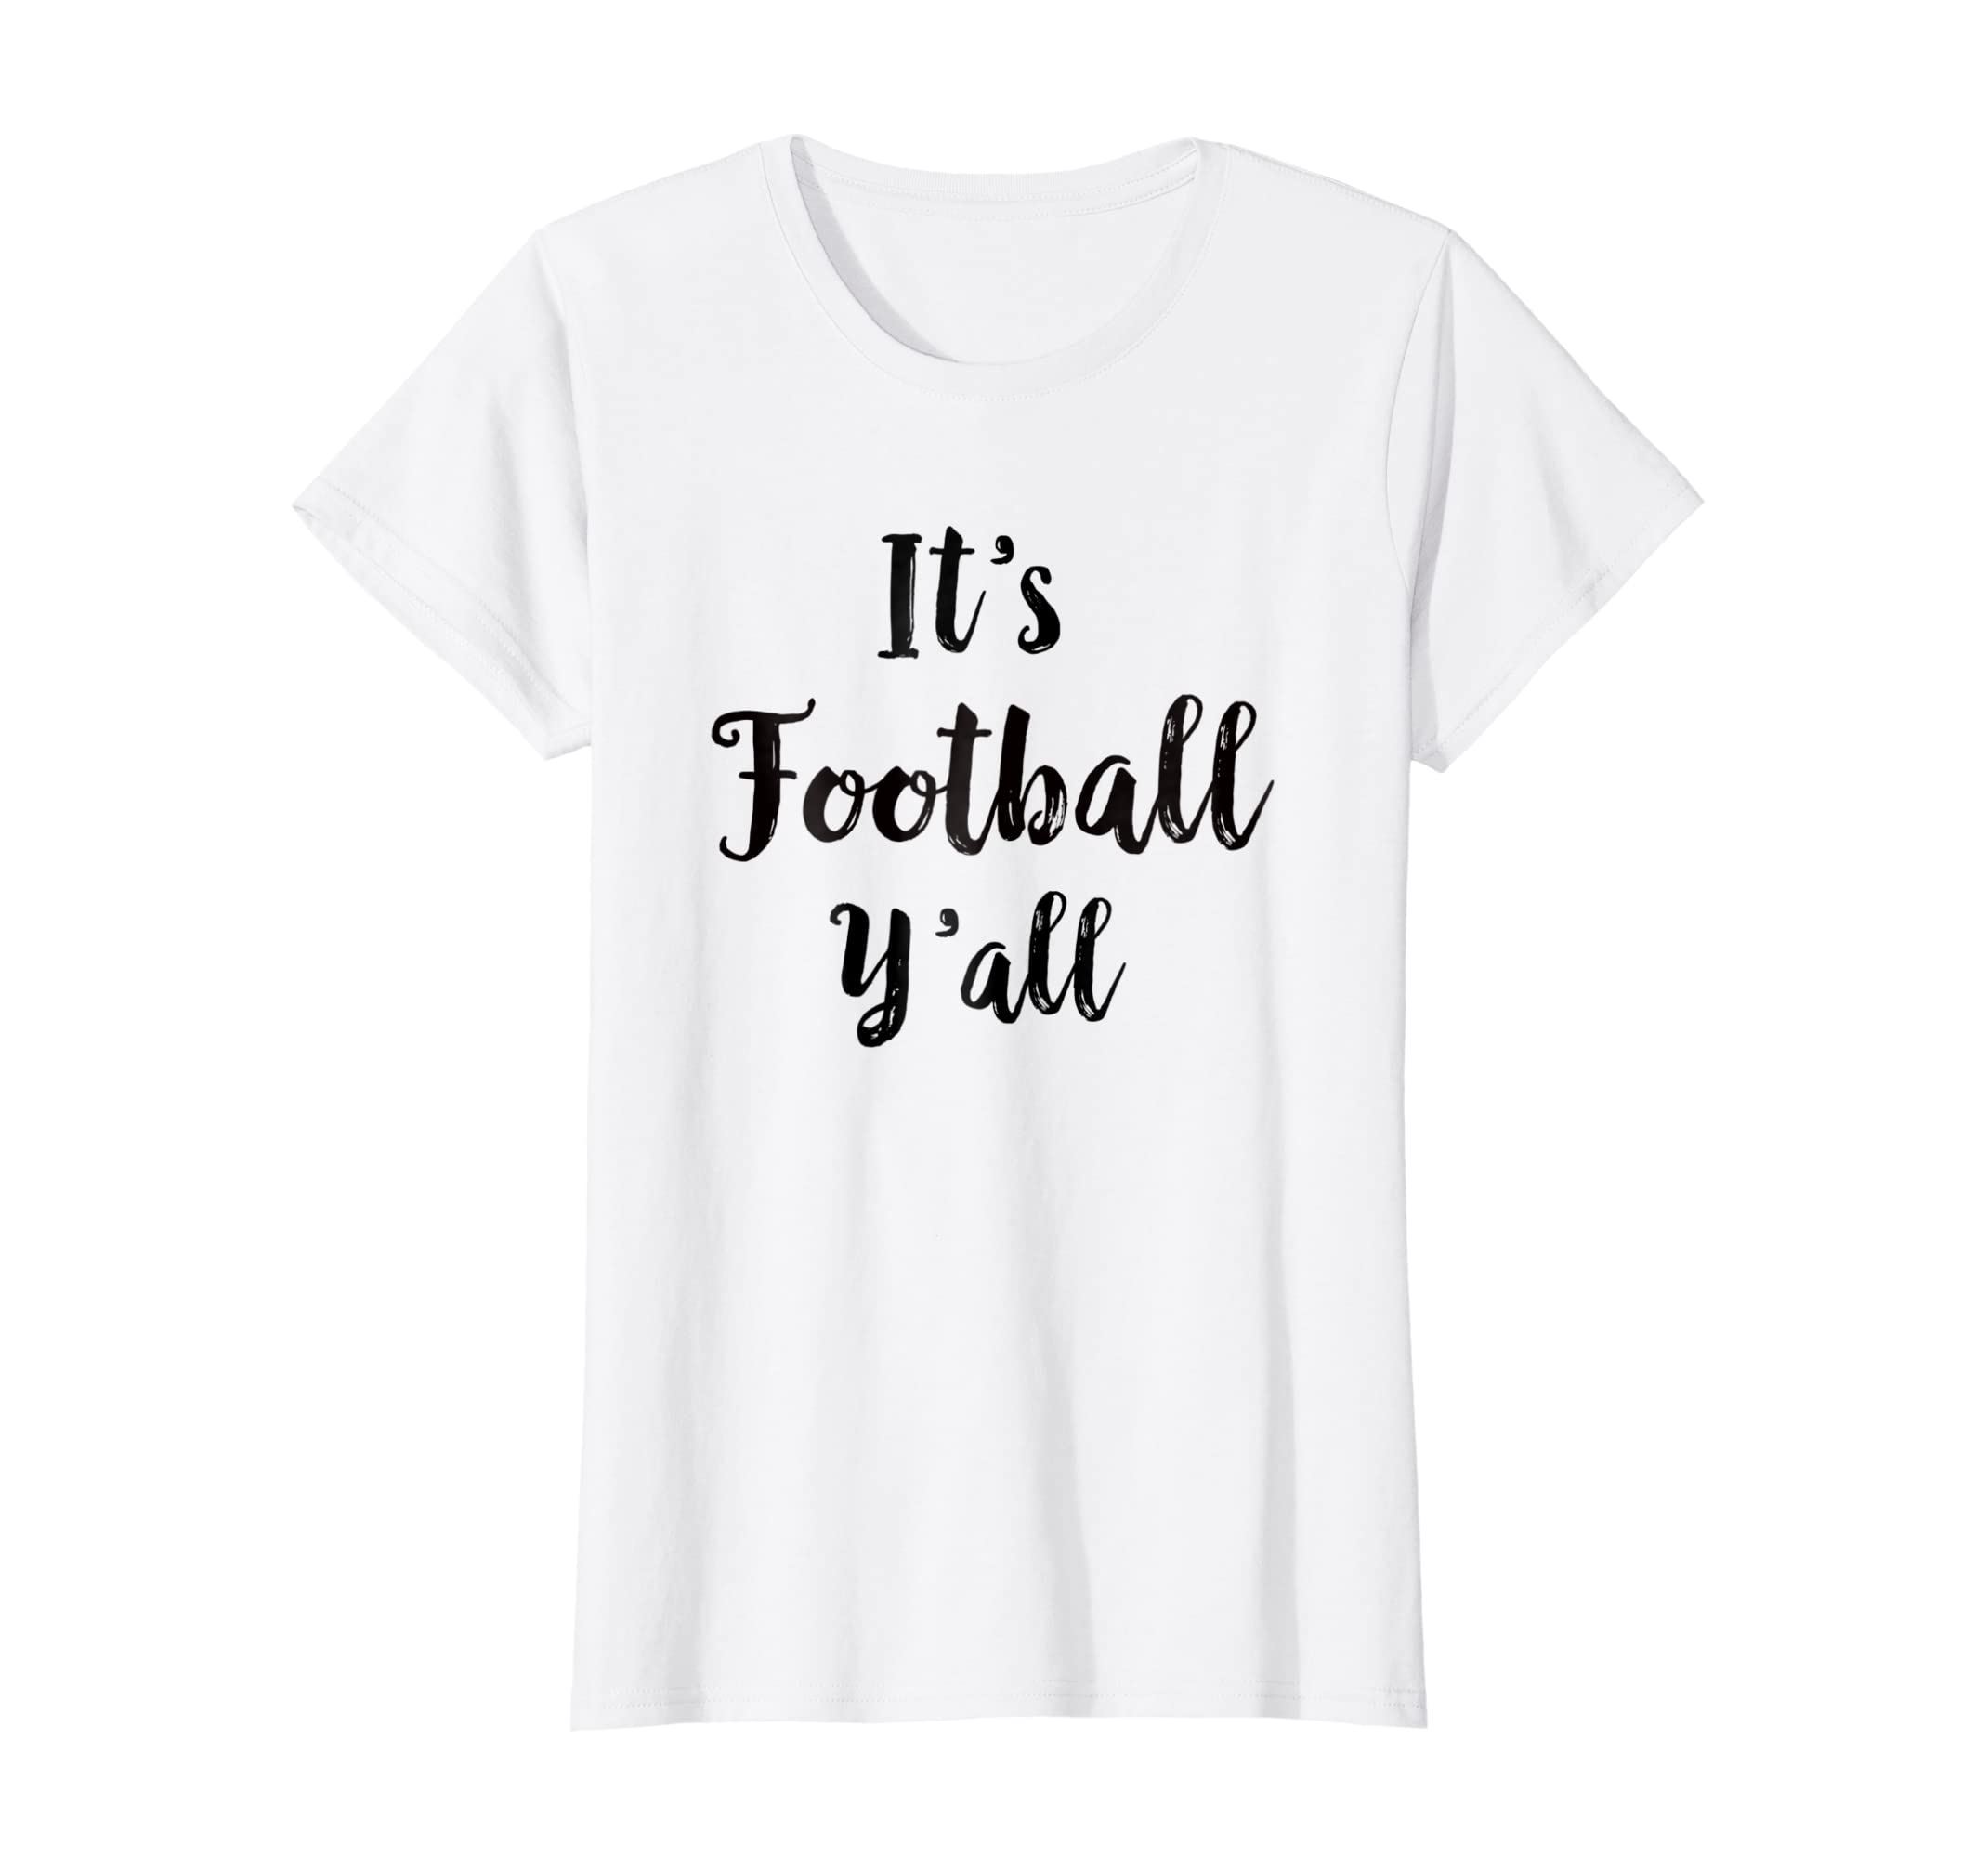 0856e2a3 Amazon.com: Its Football Yall T-Shirt Football Season Game Day Tailgates:  Clothing